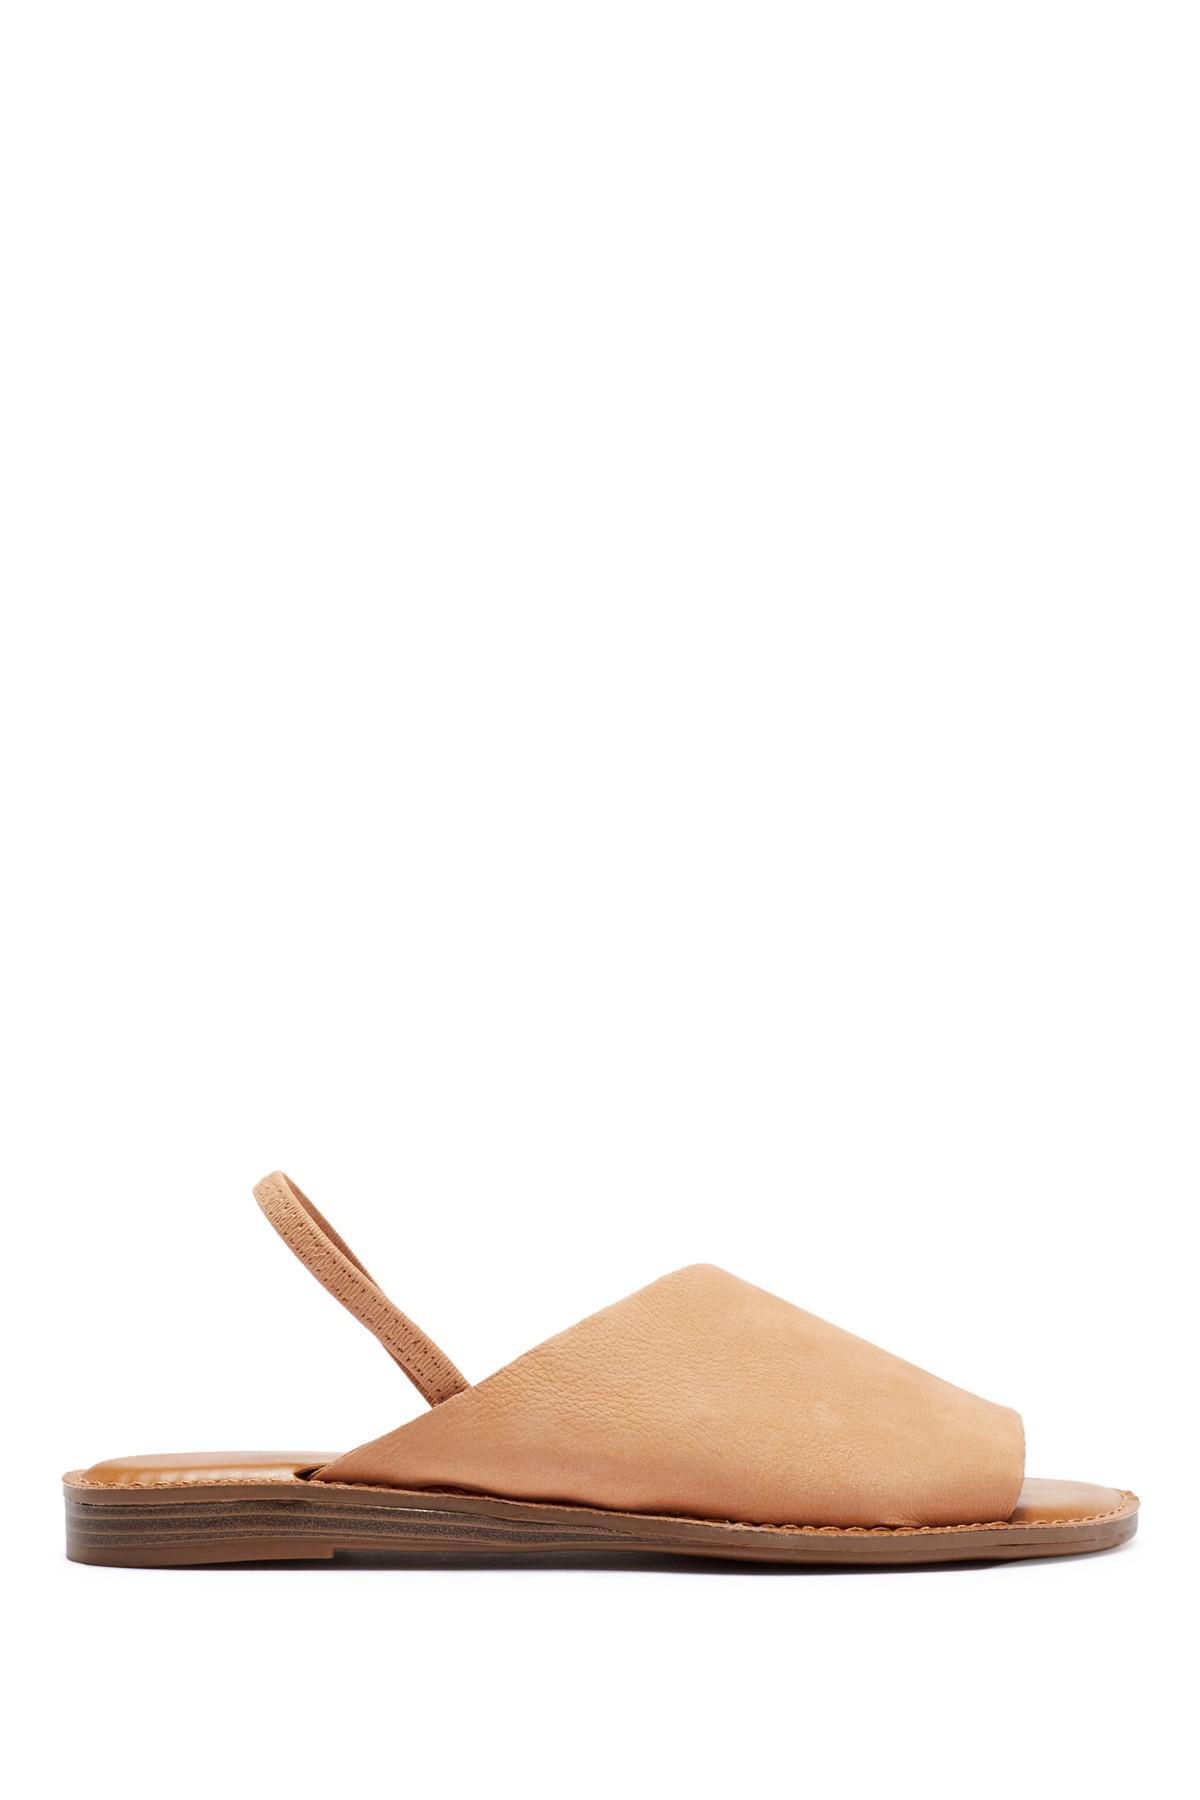 06e201692bcf Lyst - Franco Sarto Glory Leather Sandal